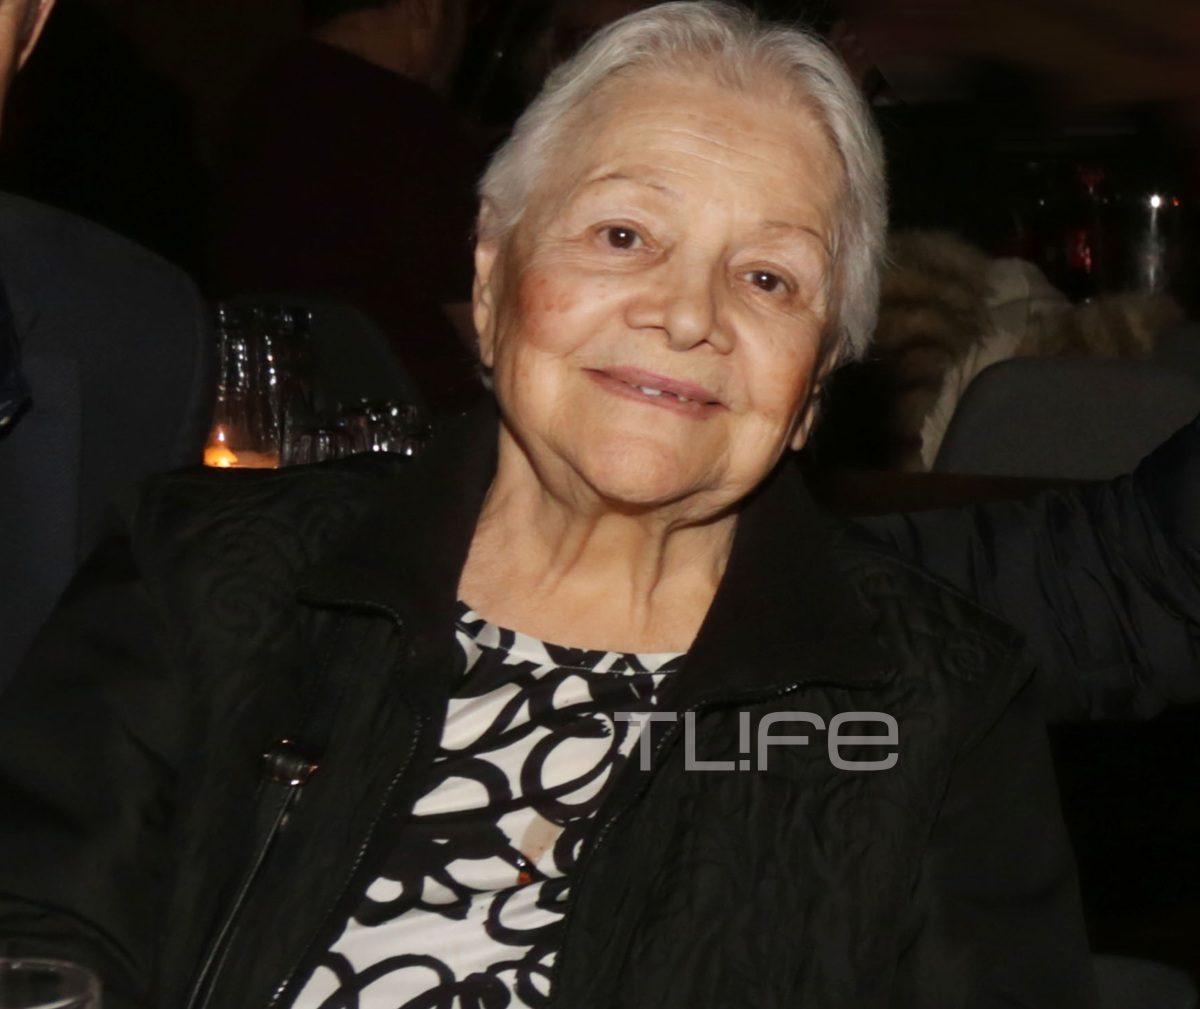 Mαίρη Λίντα: Σπάνια έξοδος για τη αγαπημένη τραγουδίστρια που ζει στο γηροκομείο! [pics]   tlife.gr